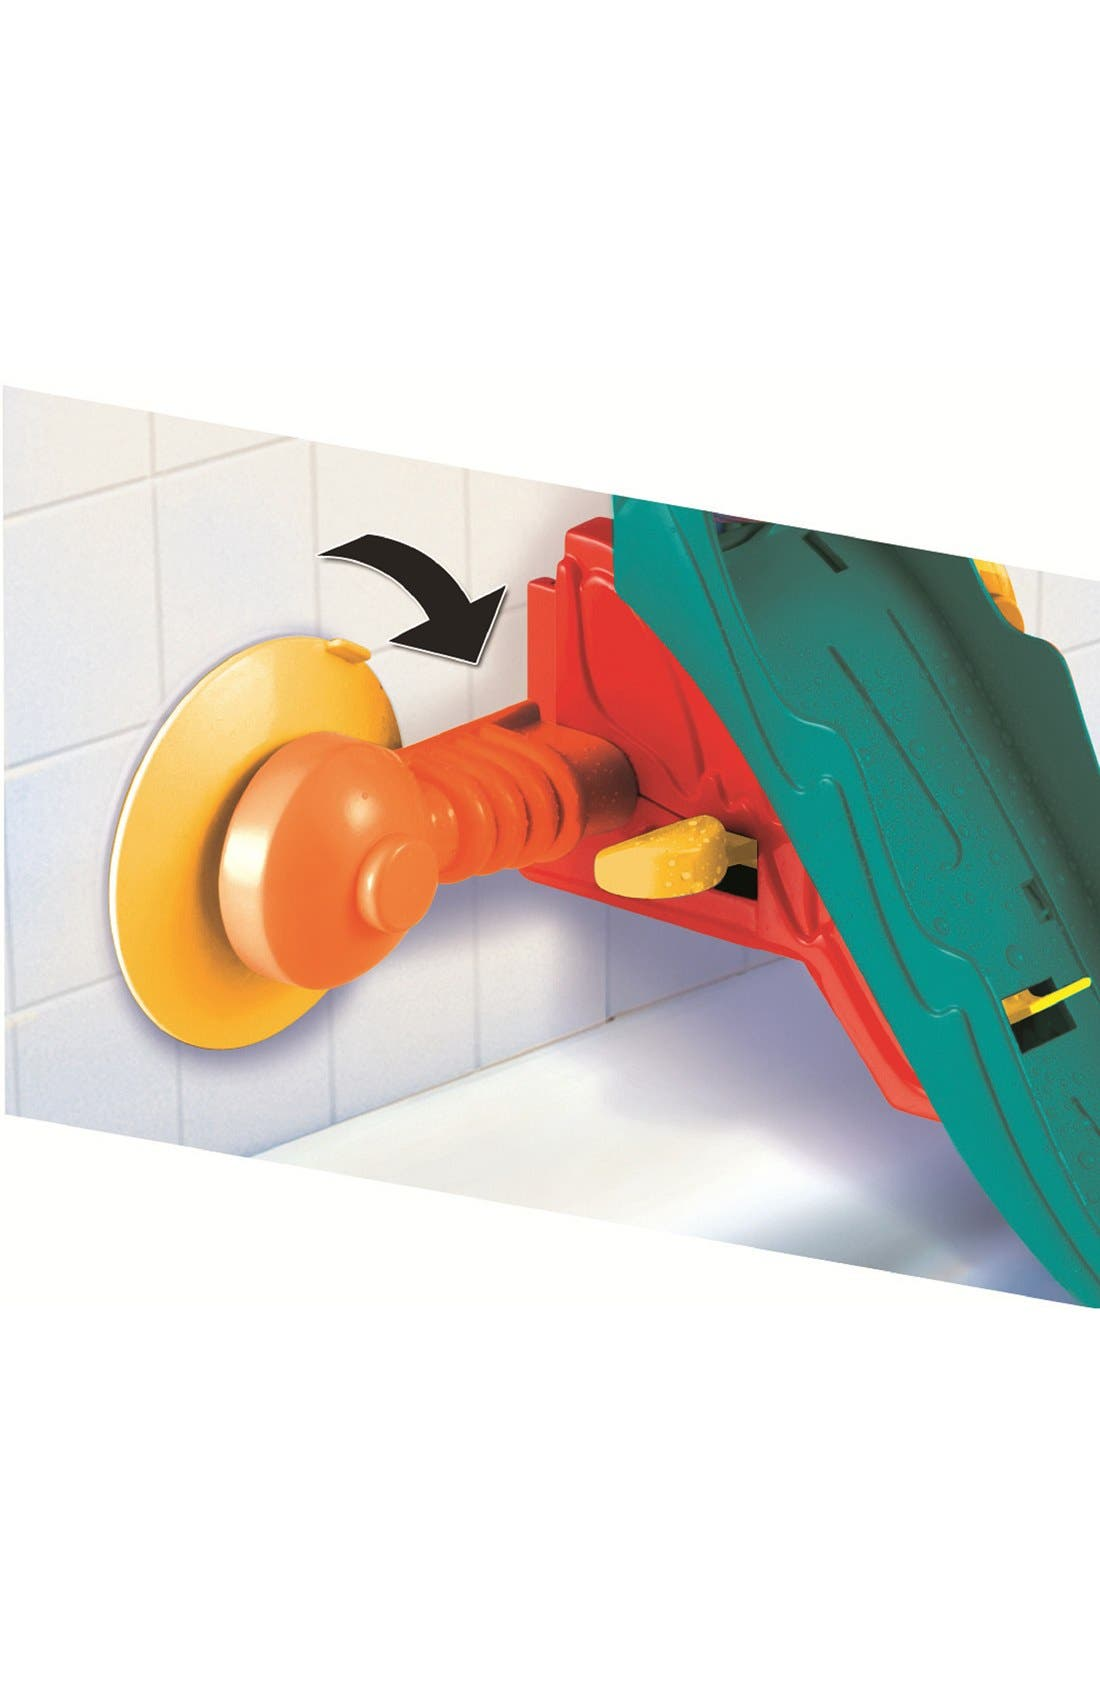 MATTEL,                             'Hot Wheels<sup>®</sup> - Splash Track<sup>™</sup>' Tub Track Set,                             Alternate thumbnail 5, color,                             400